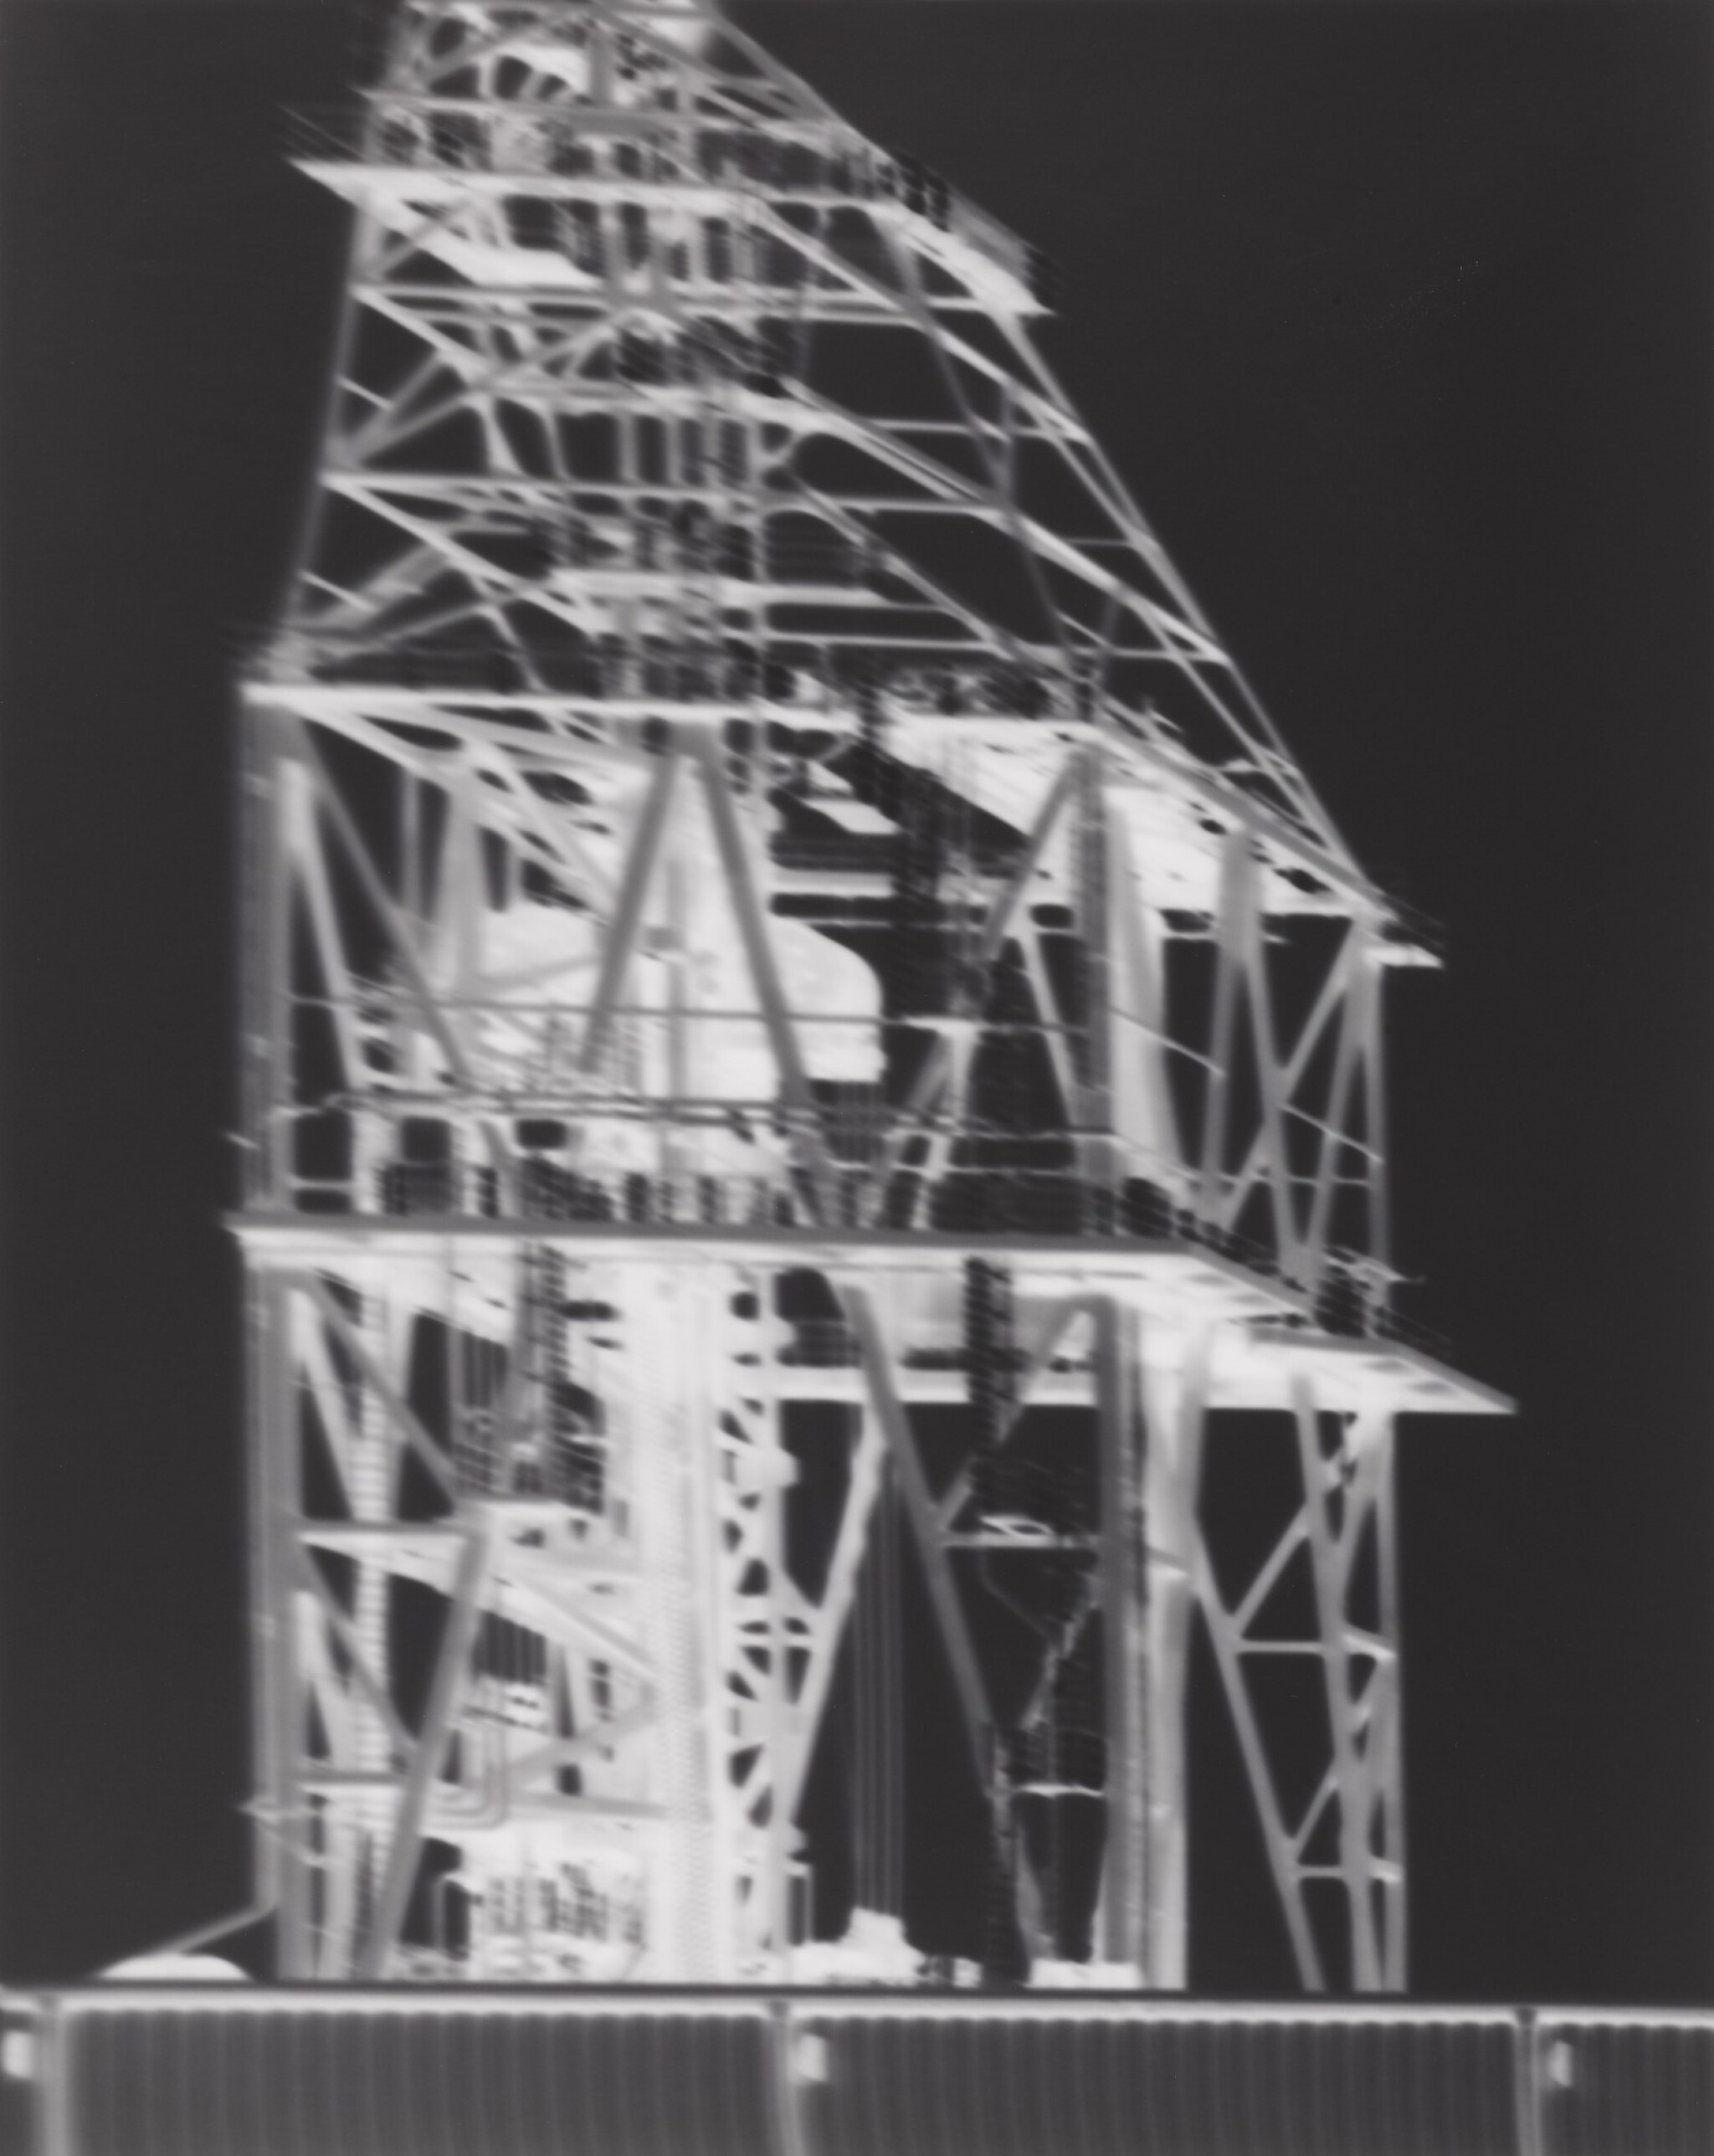 View full screen - View 1 of Lot 183. Kvaerner Drilling Tower: November 29, 2000.